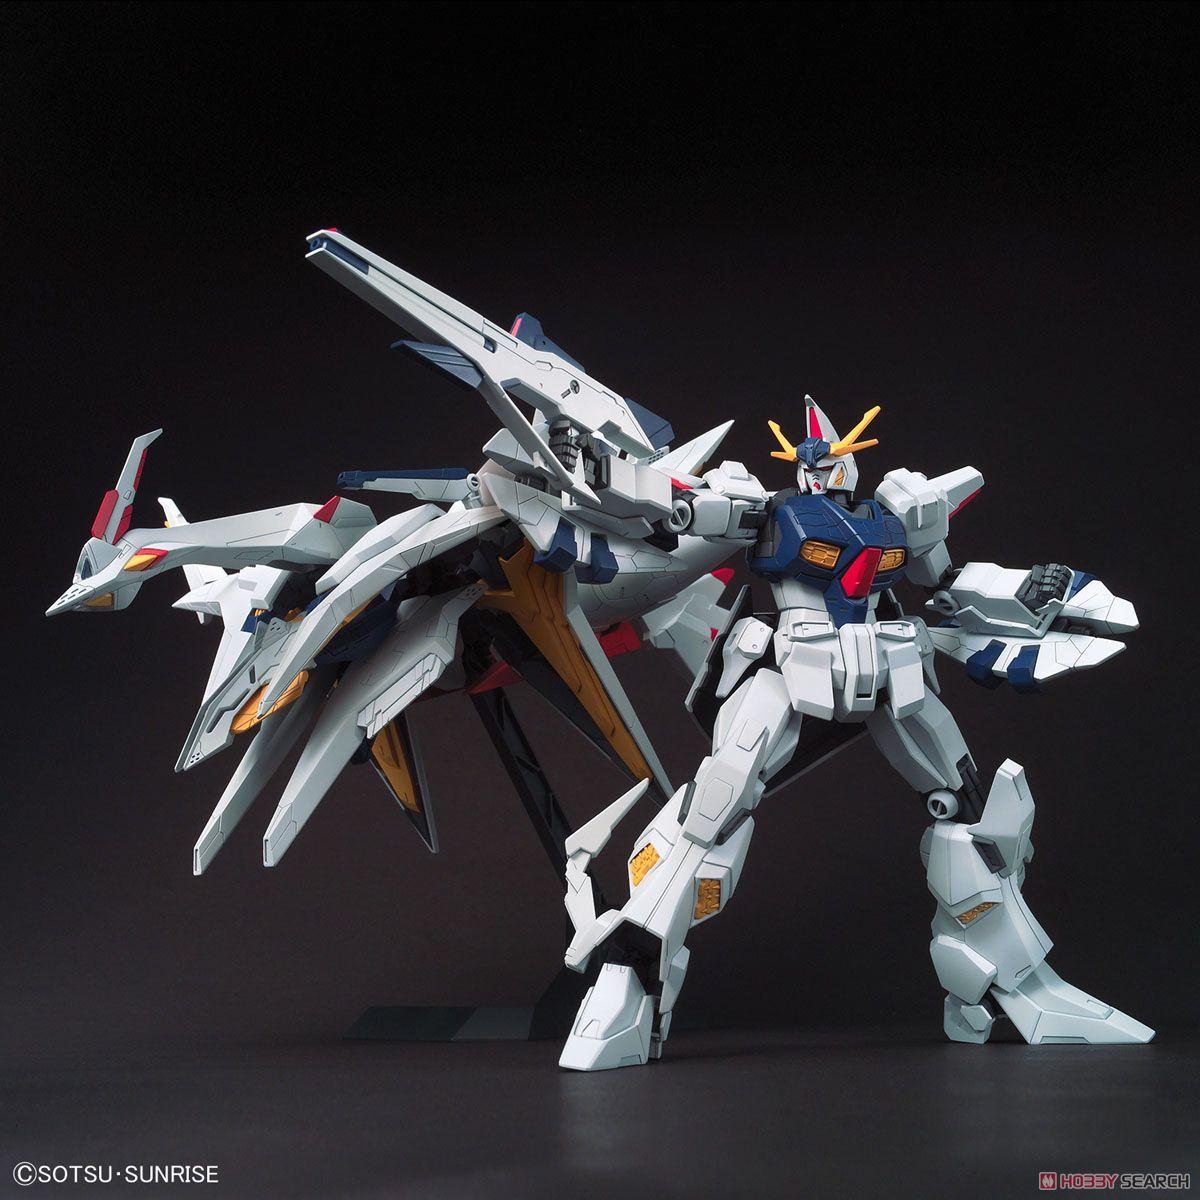 HGUC 1/144『ペーネロペー』機動戦士ガンダム 閃光のハサウェイ プラモデル-009